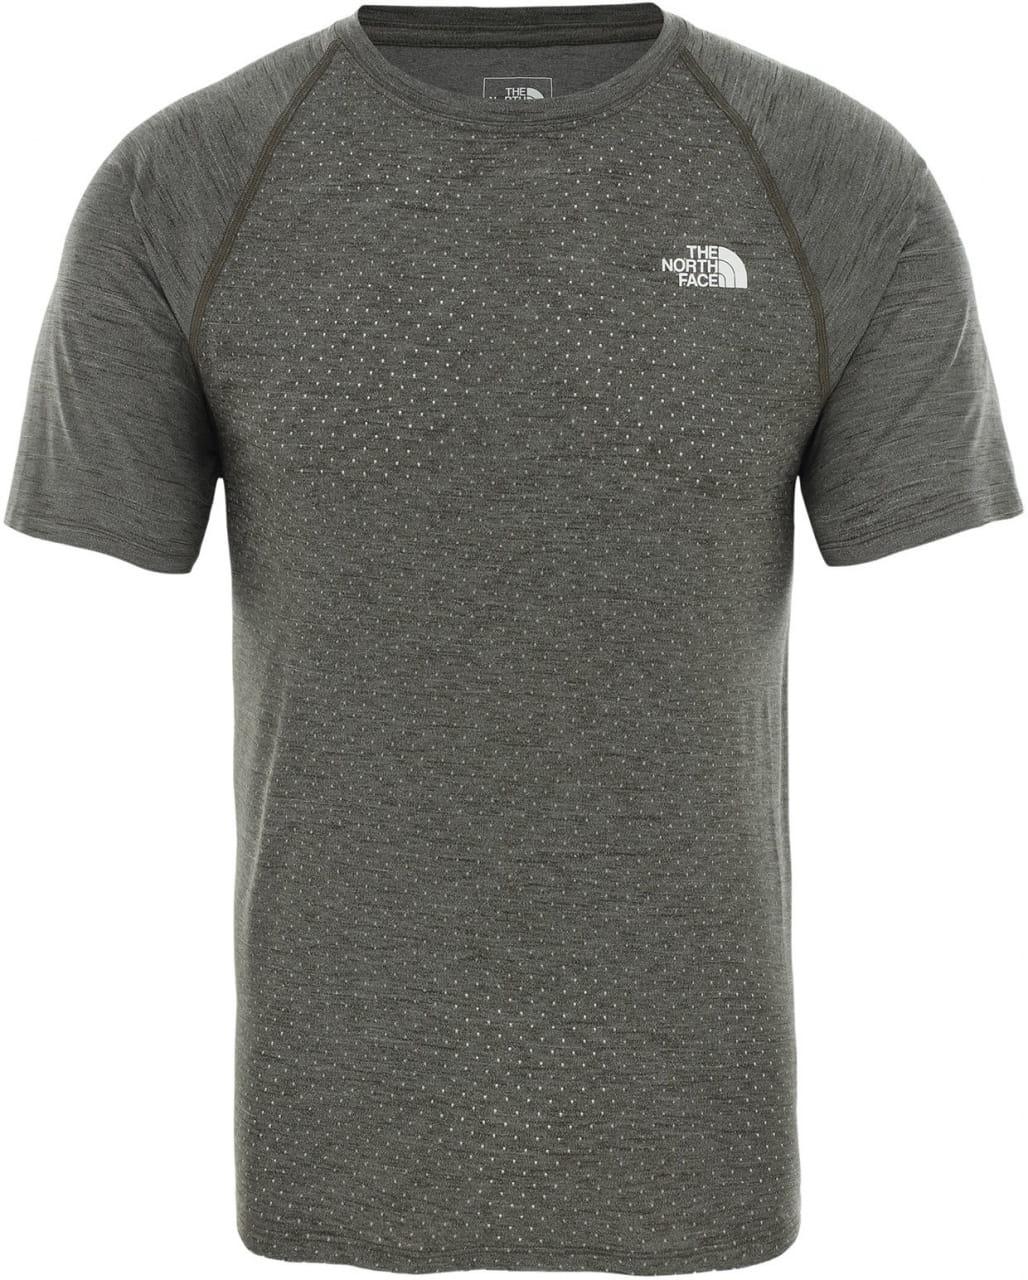 T-Shirts The North Face Men's Active Trail Jacquard T-Shirt